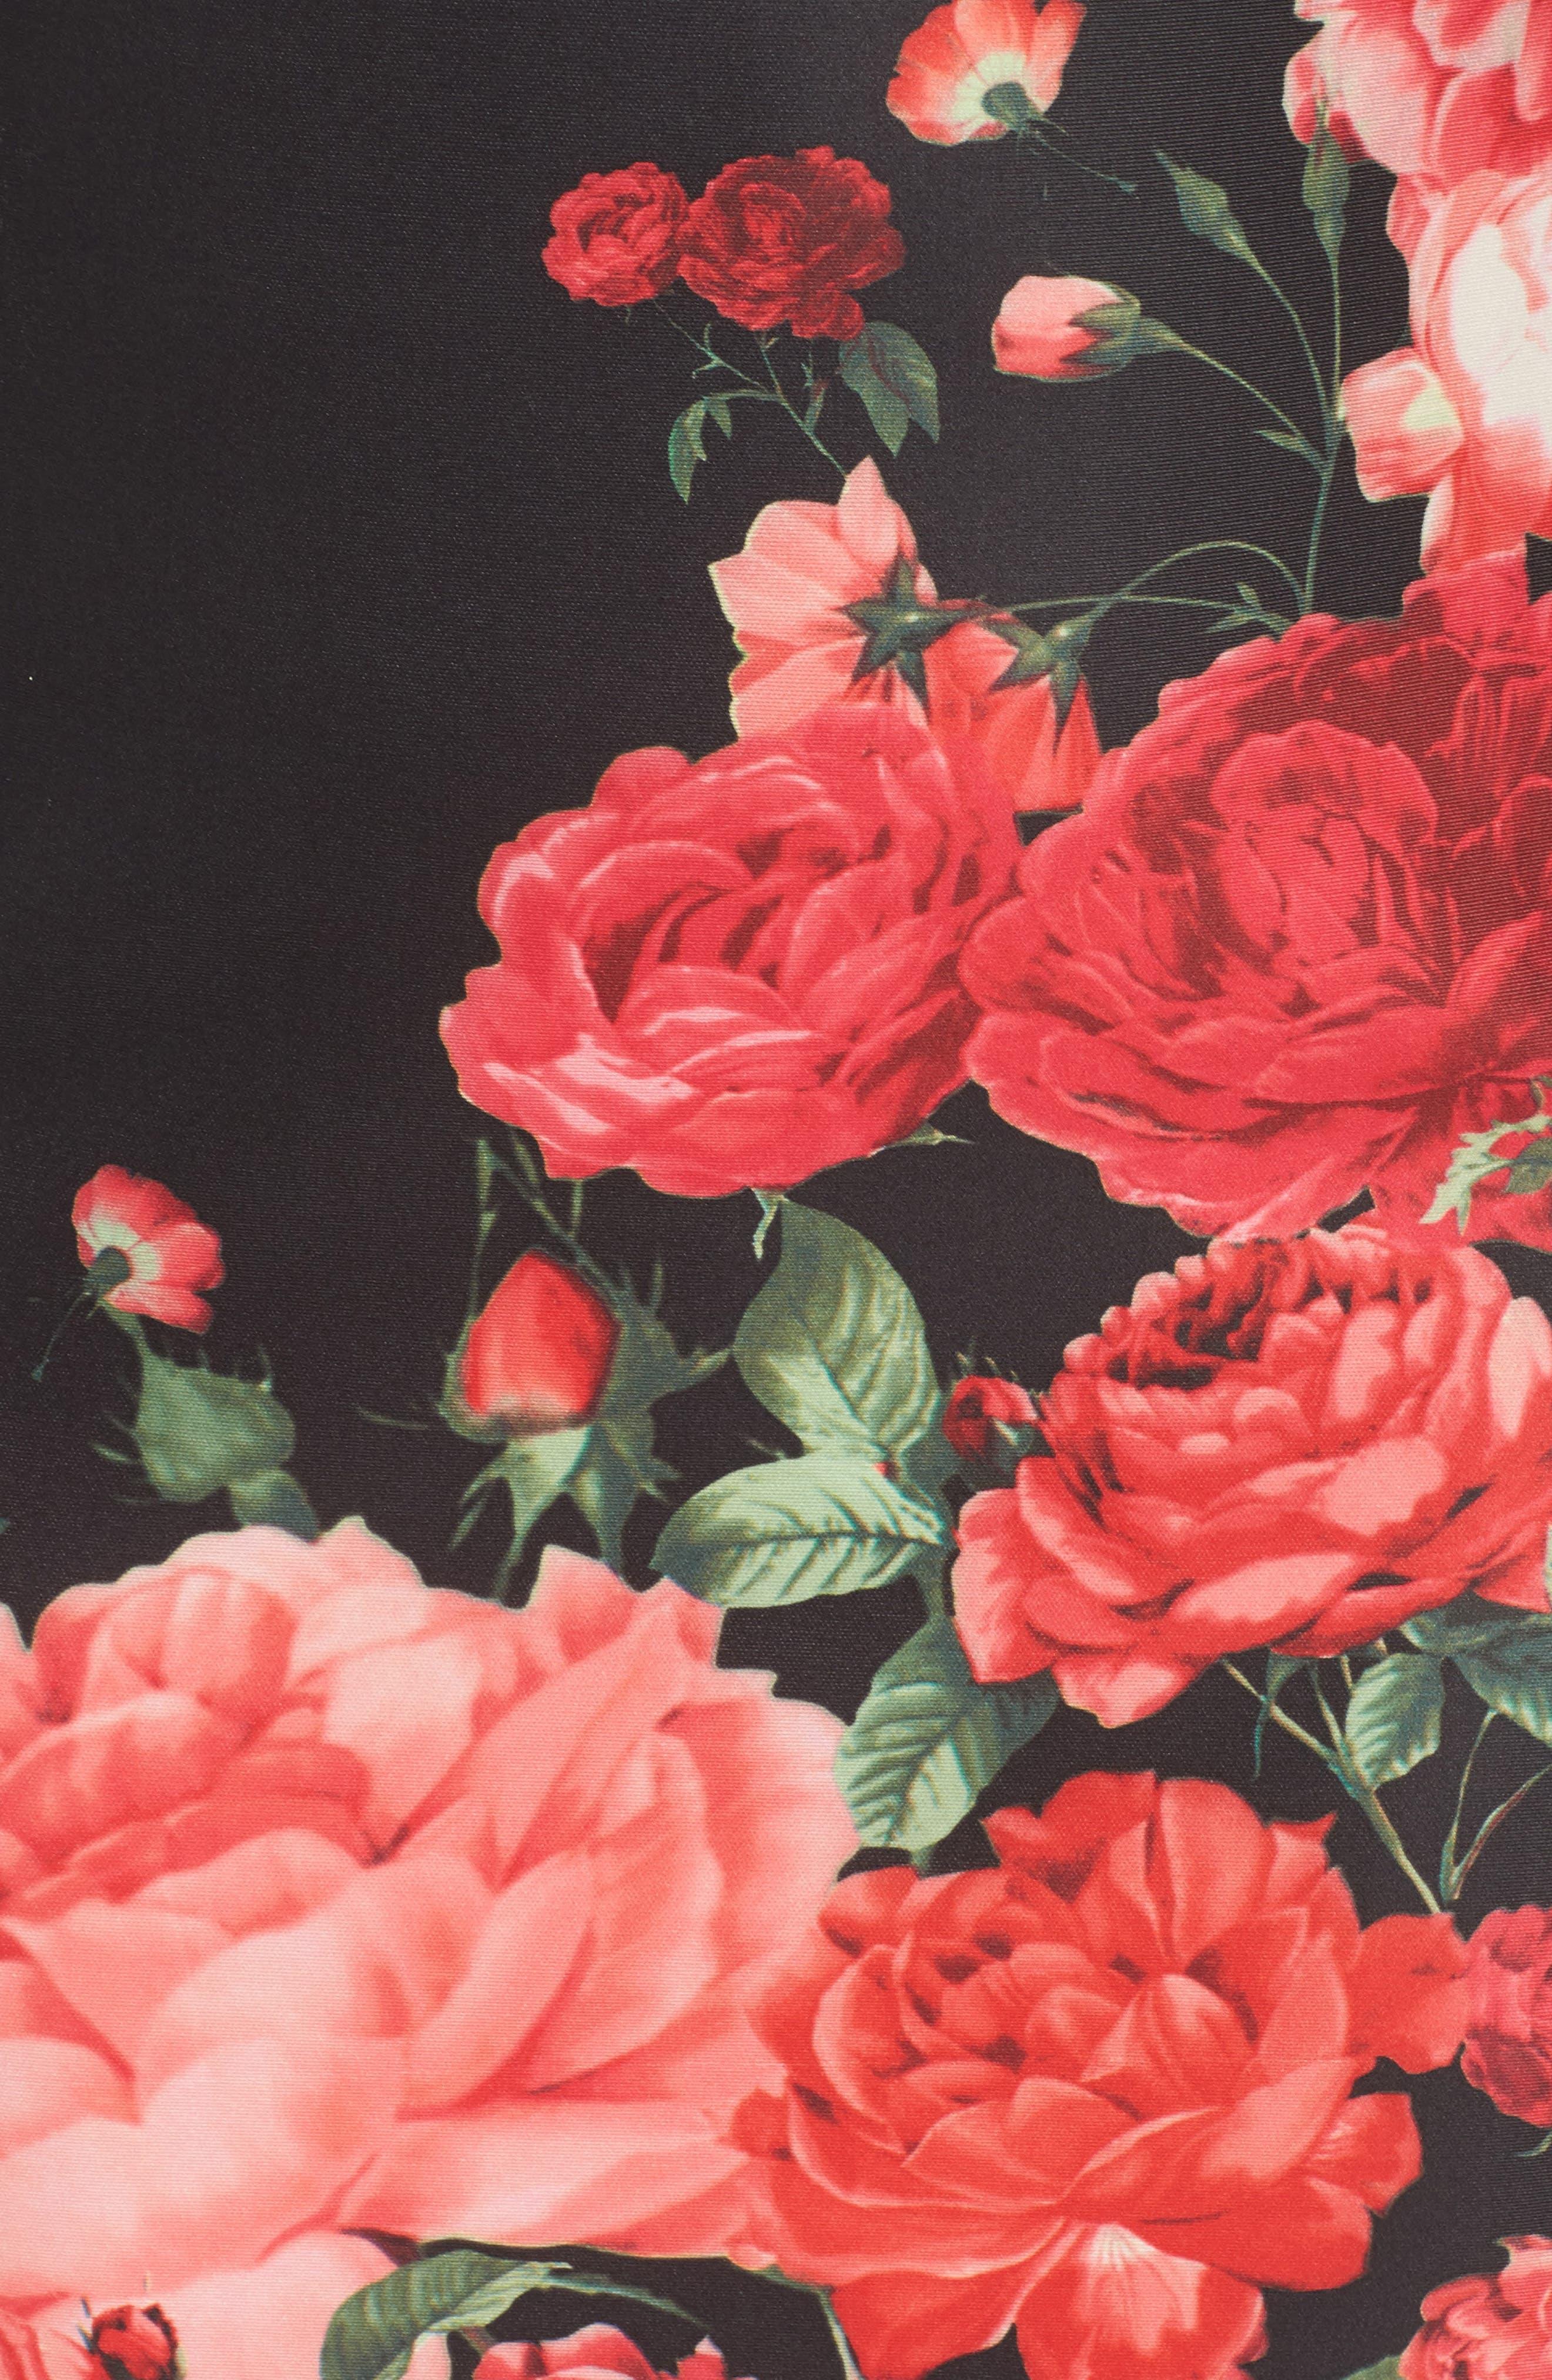 Floral Print Sheath Dress,                             Alternate thumbnail 5, color,                             Black/ Red